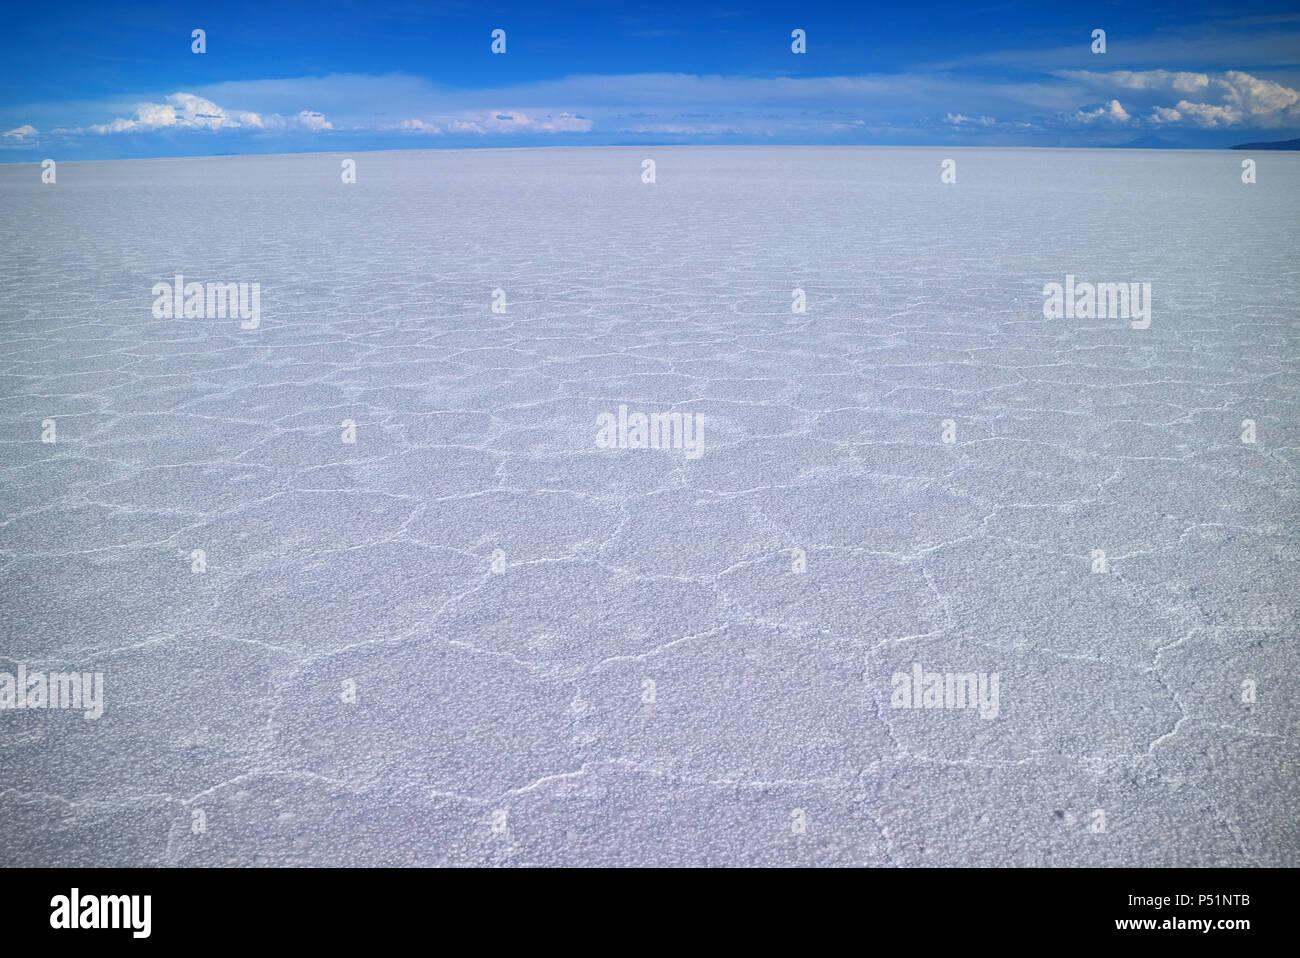 Salar de Uyuni, the world's largest salts flat, UNESCO World Heritage site in Bolivia, South America - Stock Image